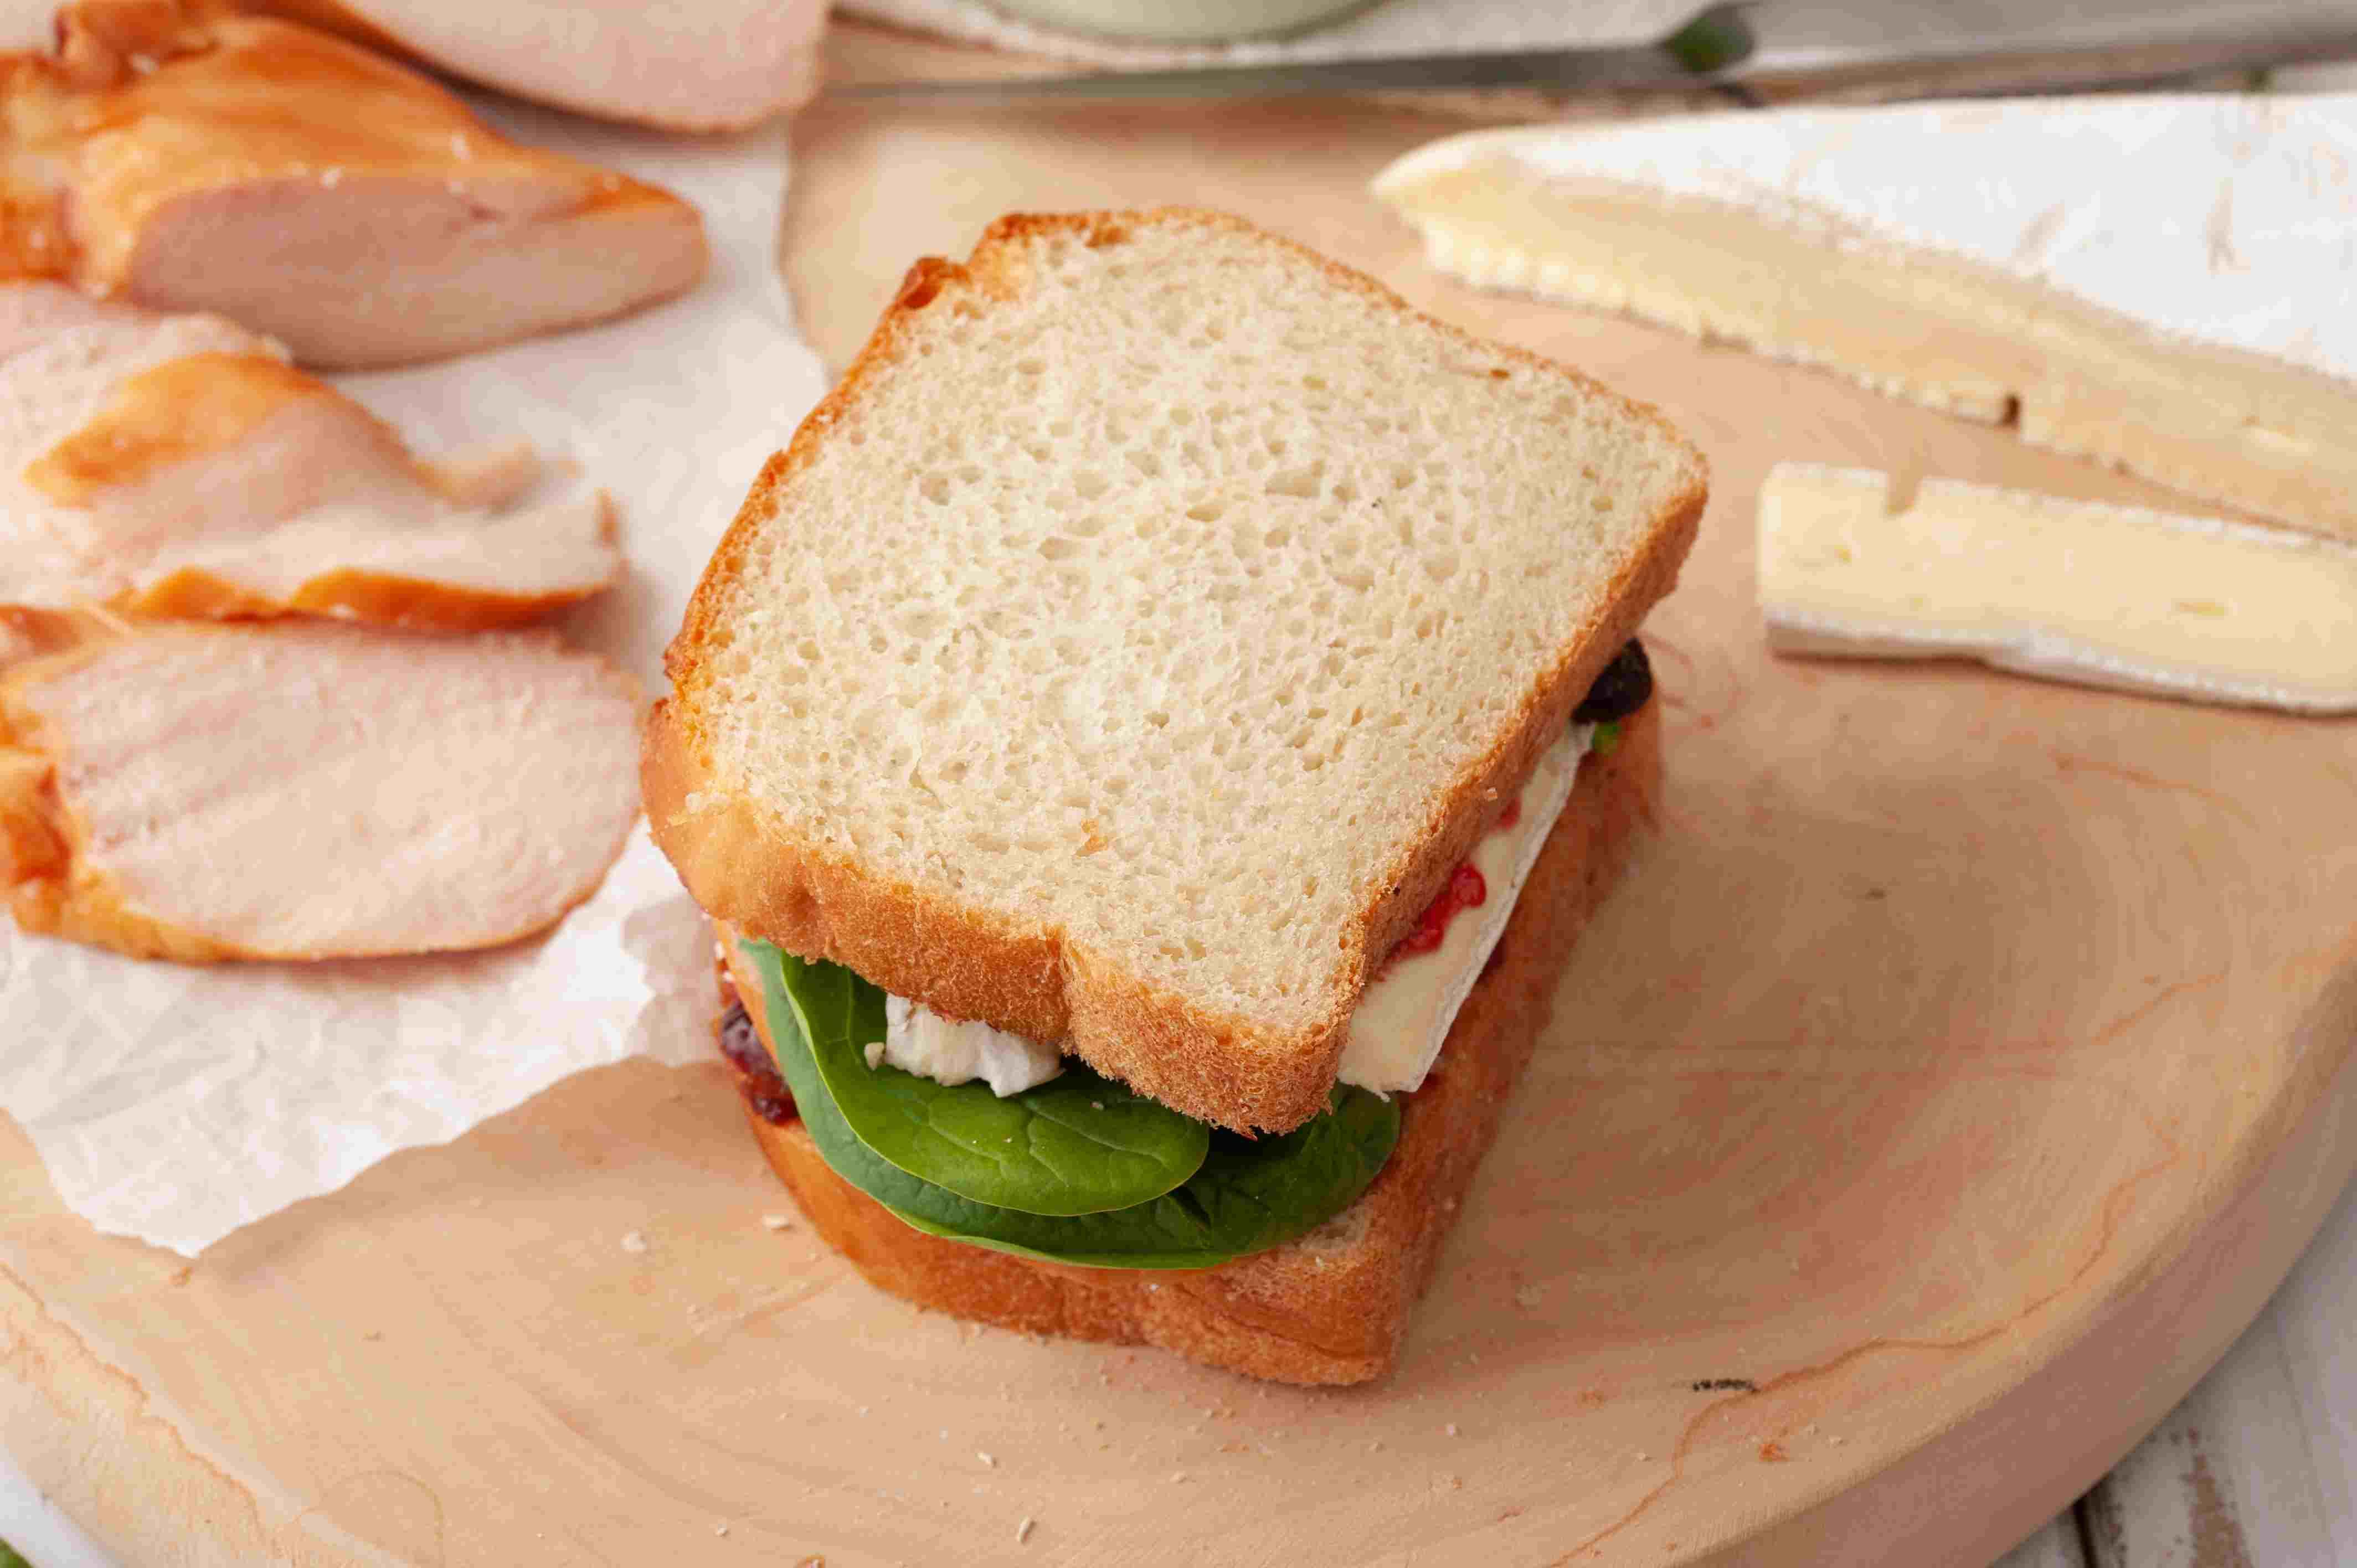 Top the sandwich